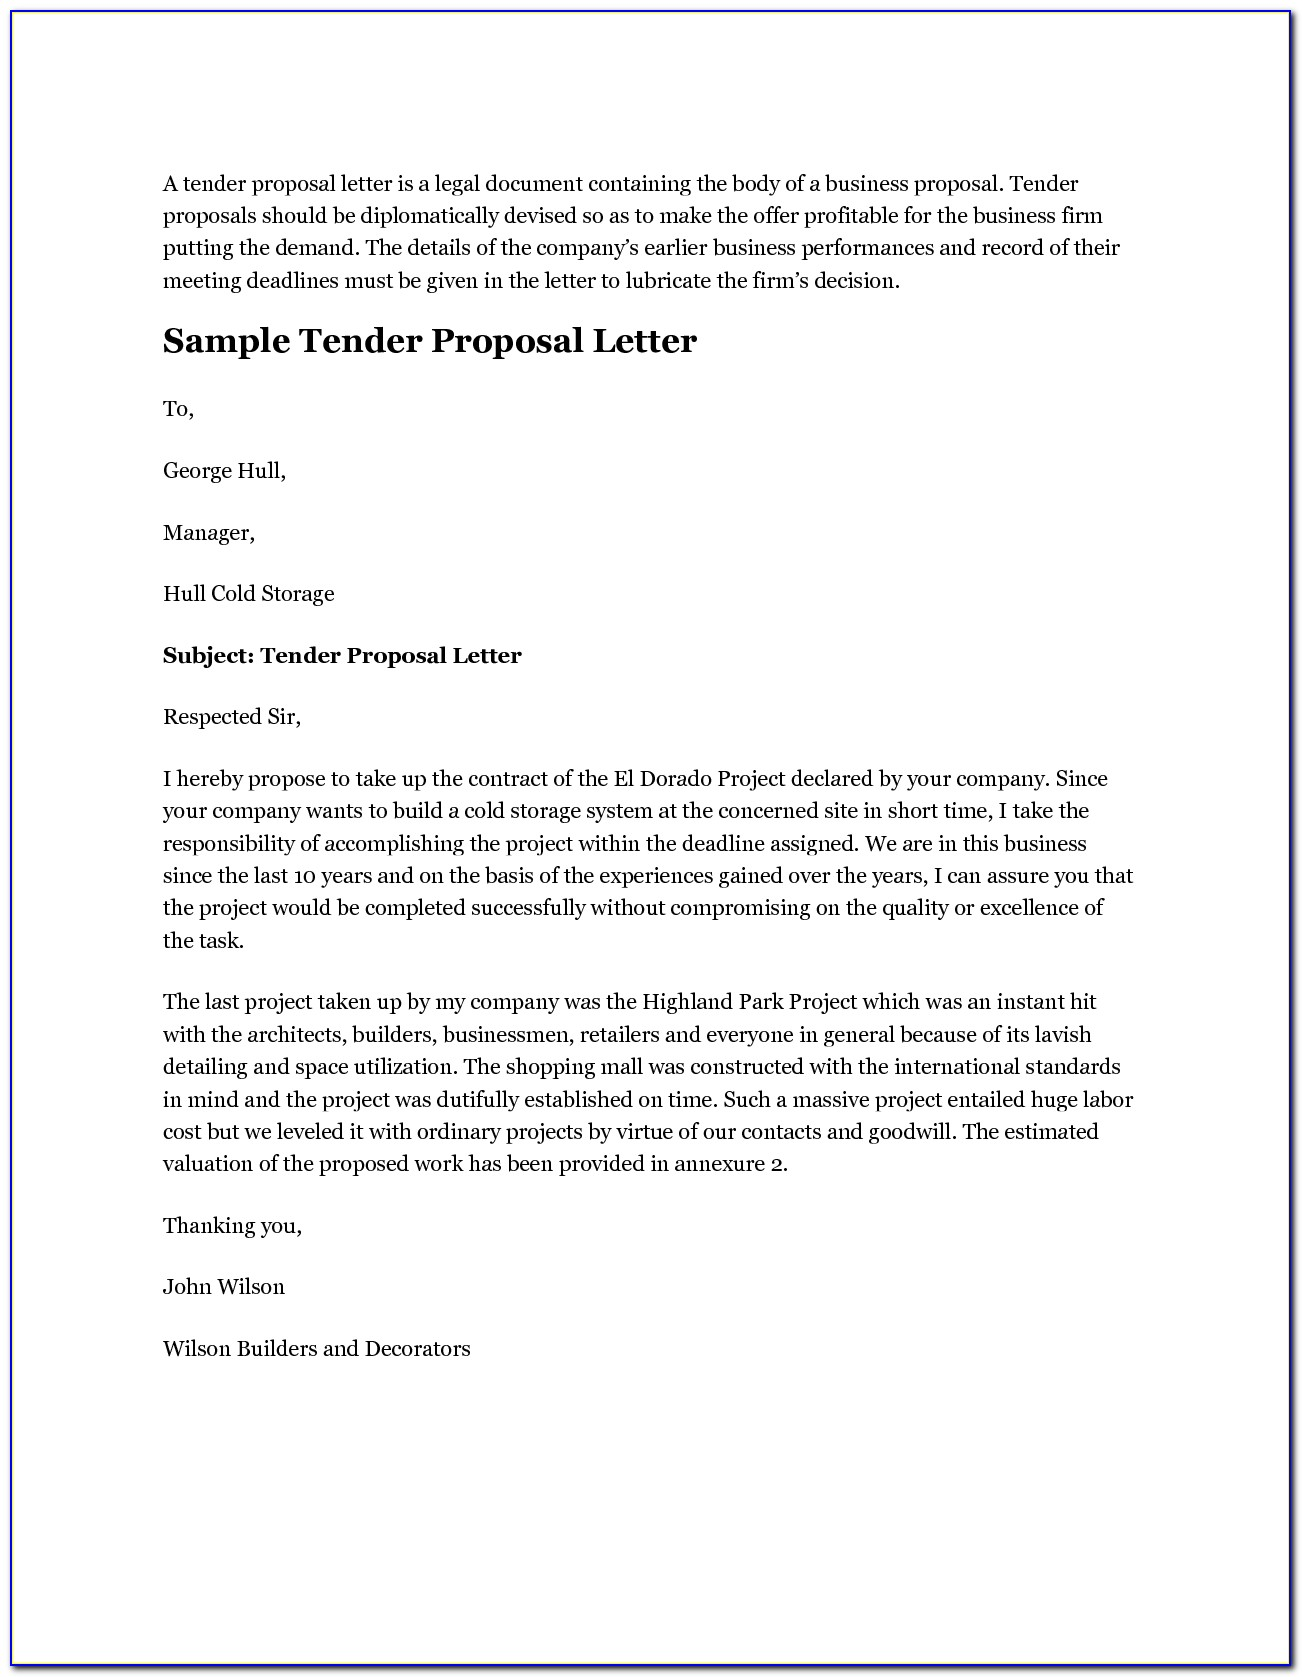 Covering Letter For Tender Proposal - Cover Letter : Resume ...